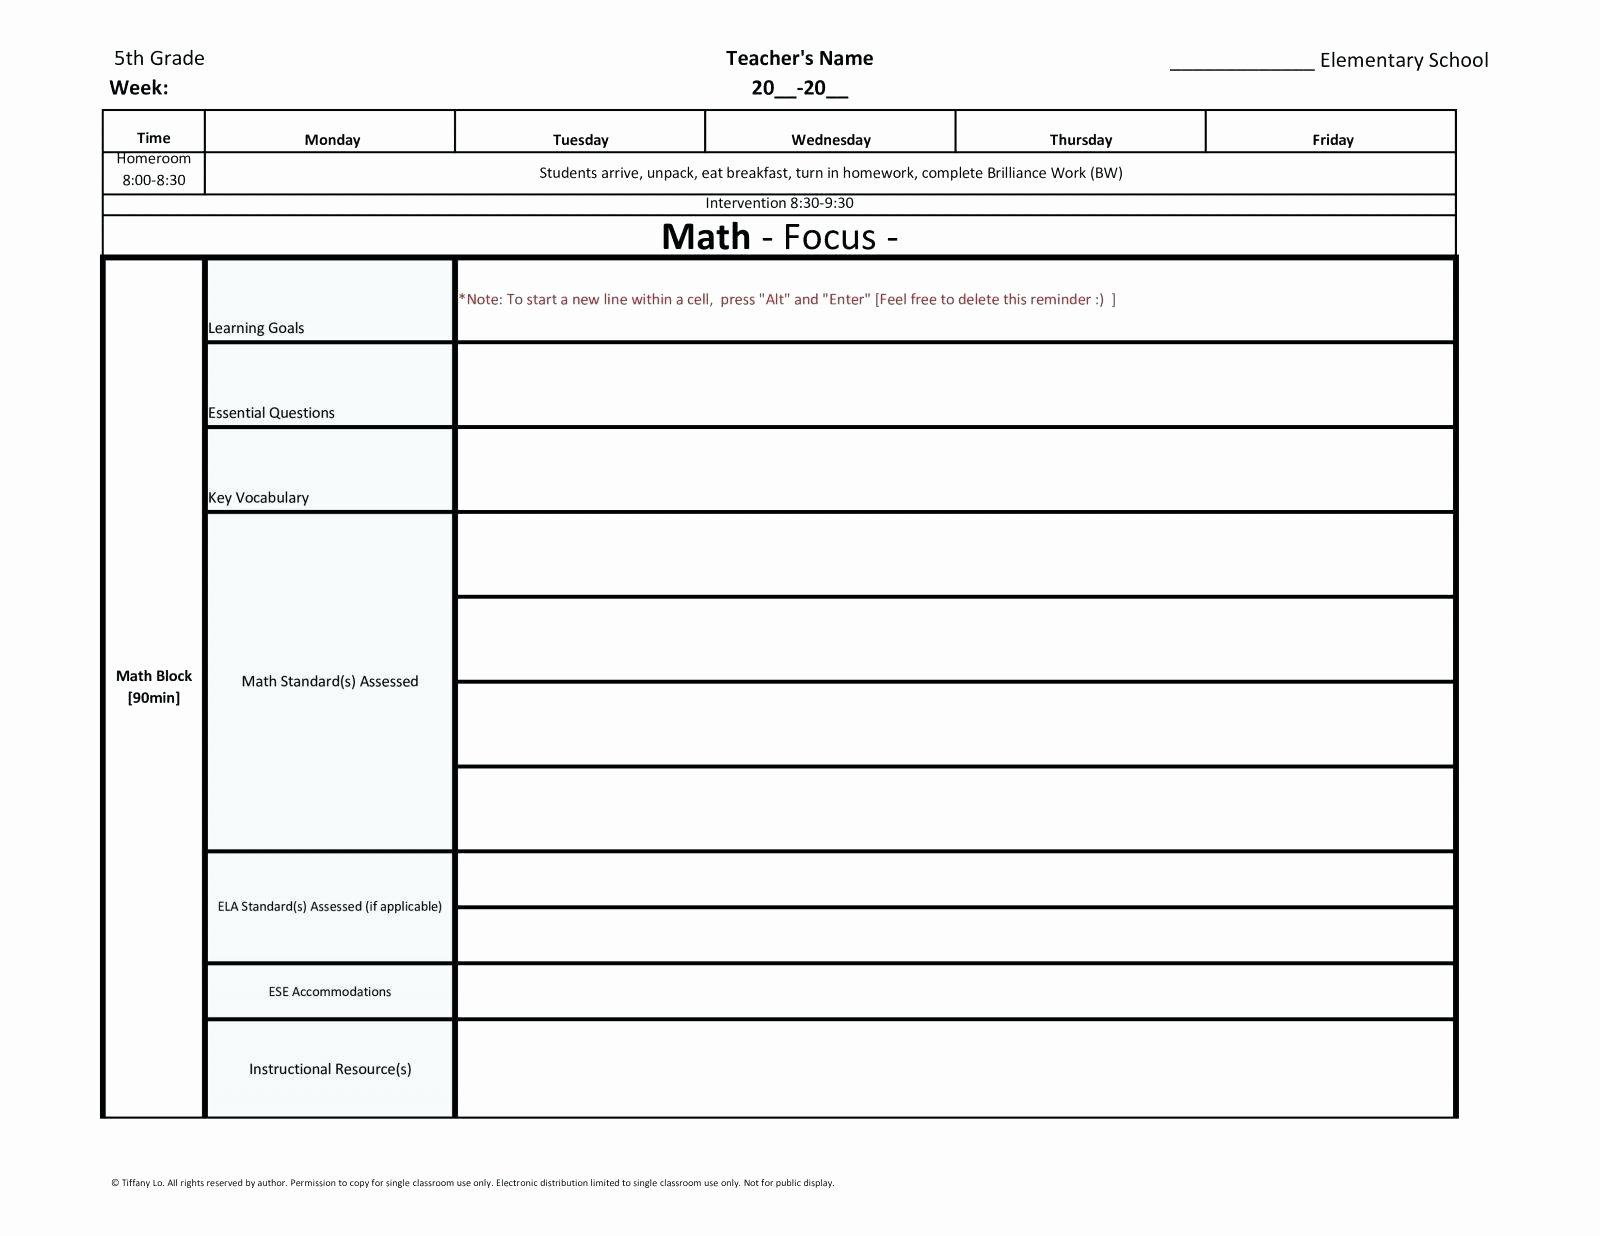 5th Grade Lesson Plan Template Fresh Fifth Grade Science Lesson Plans Fifth Grade Weekly Lesson